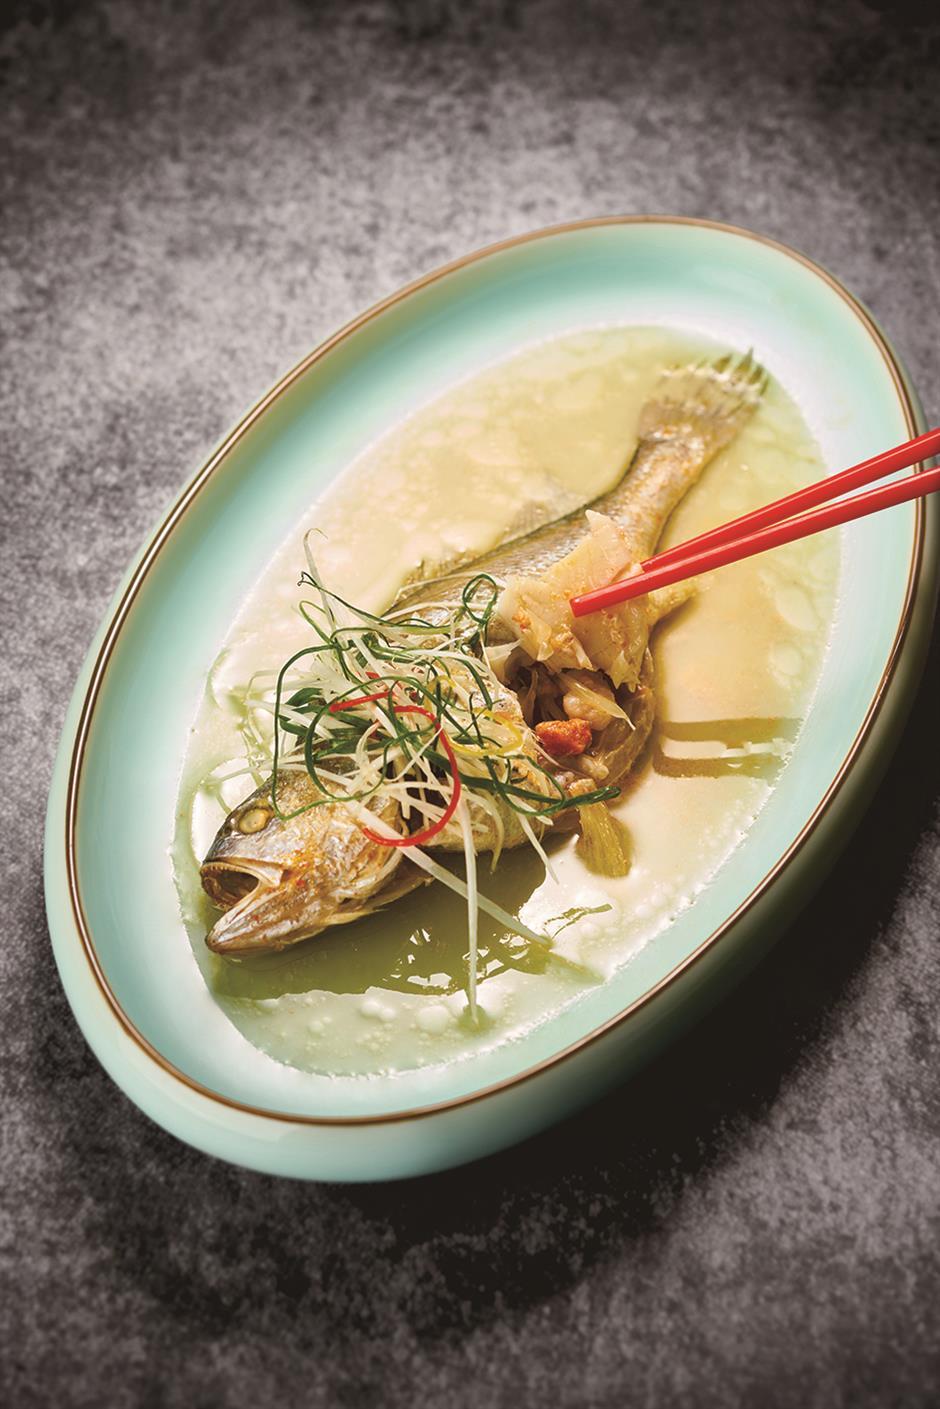 Delicious cuisine … and no bones about it